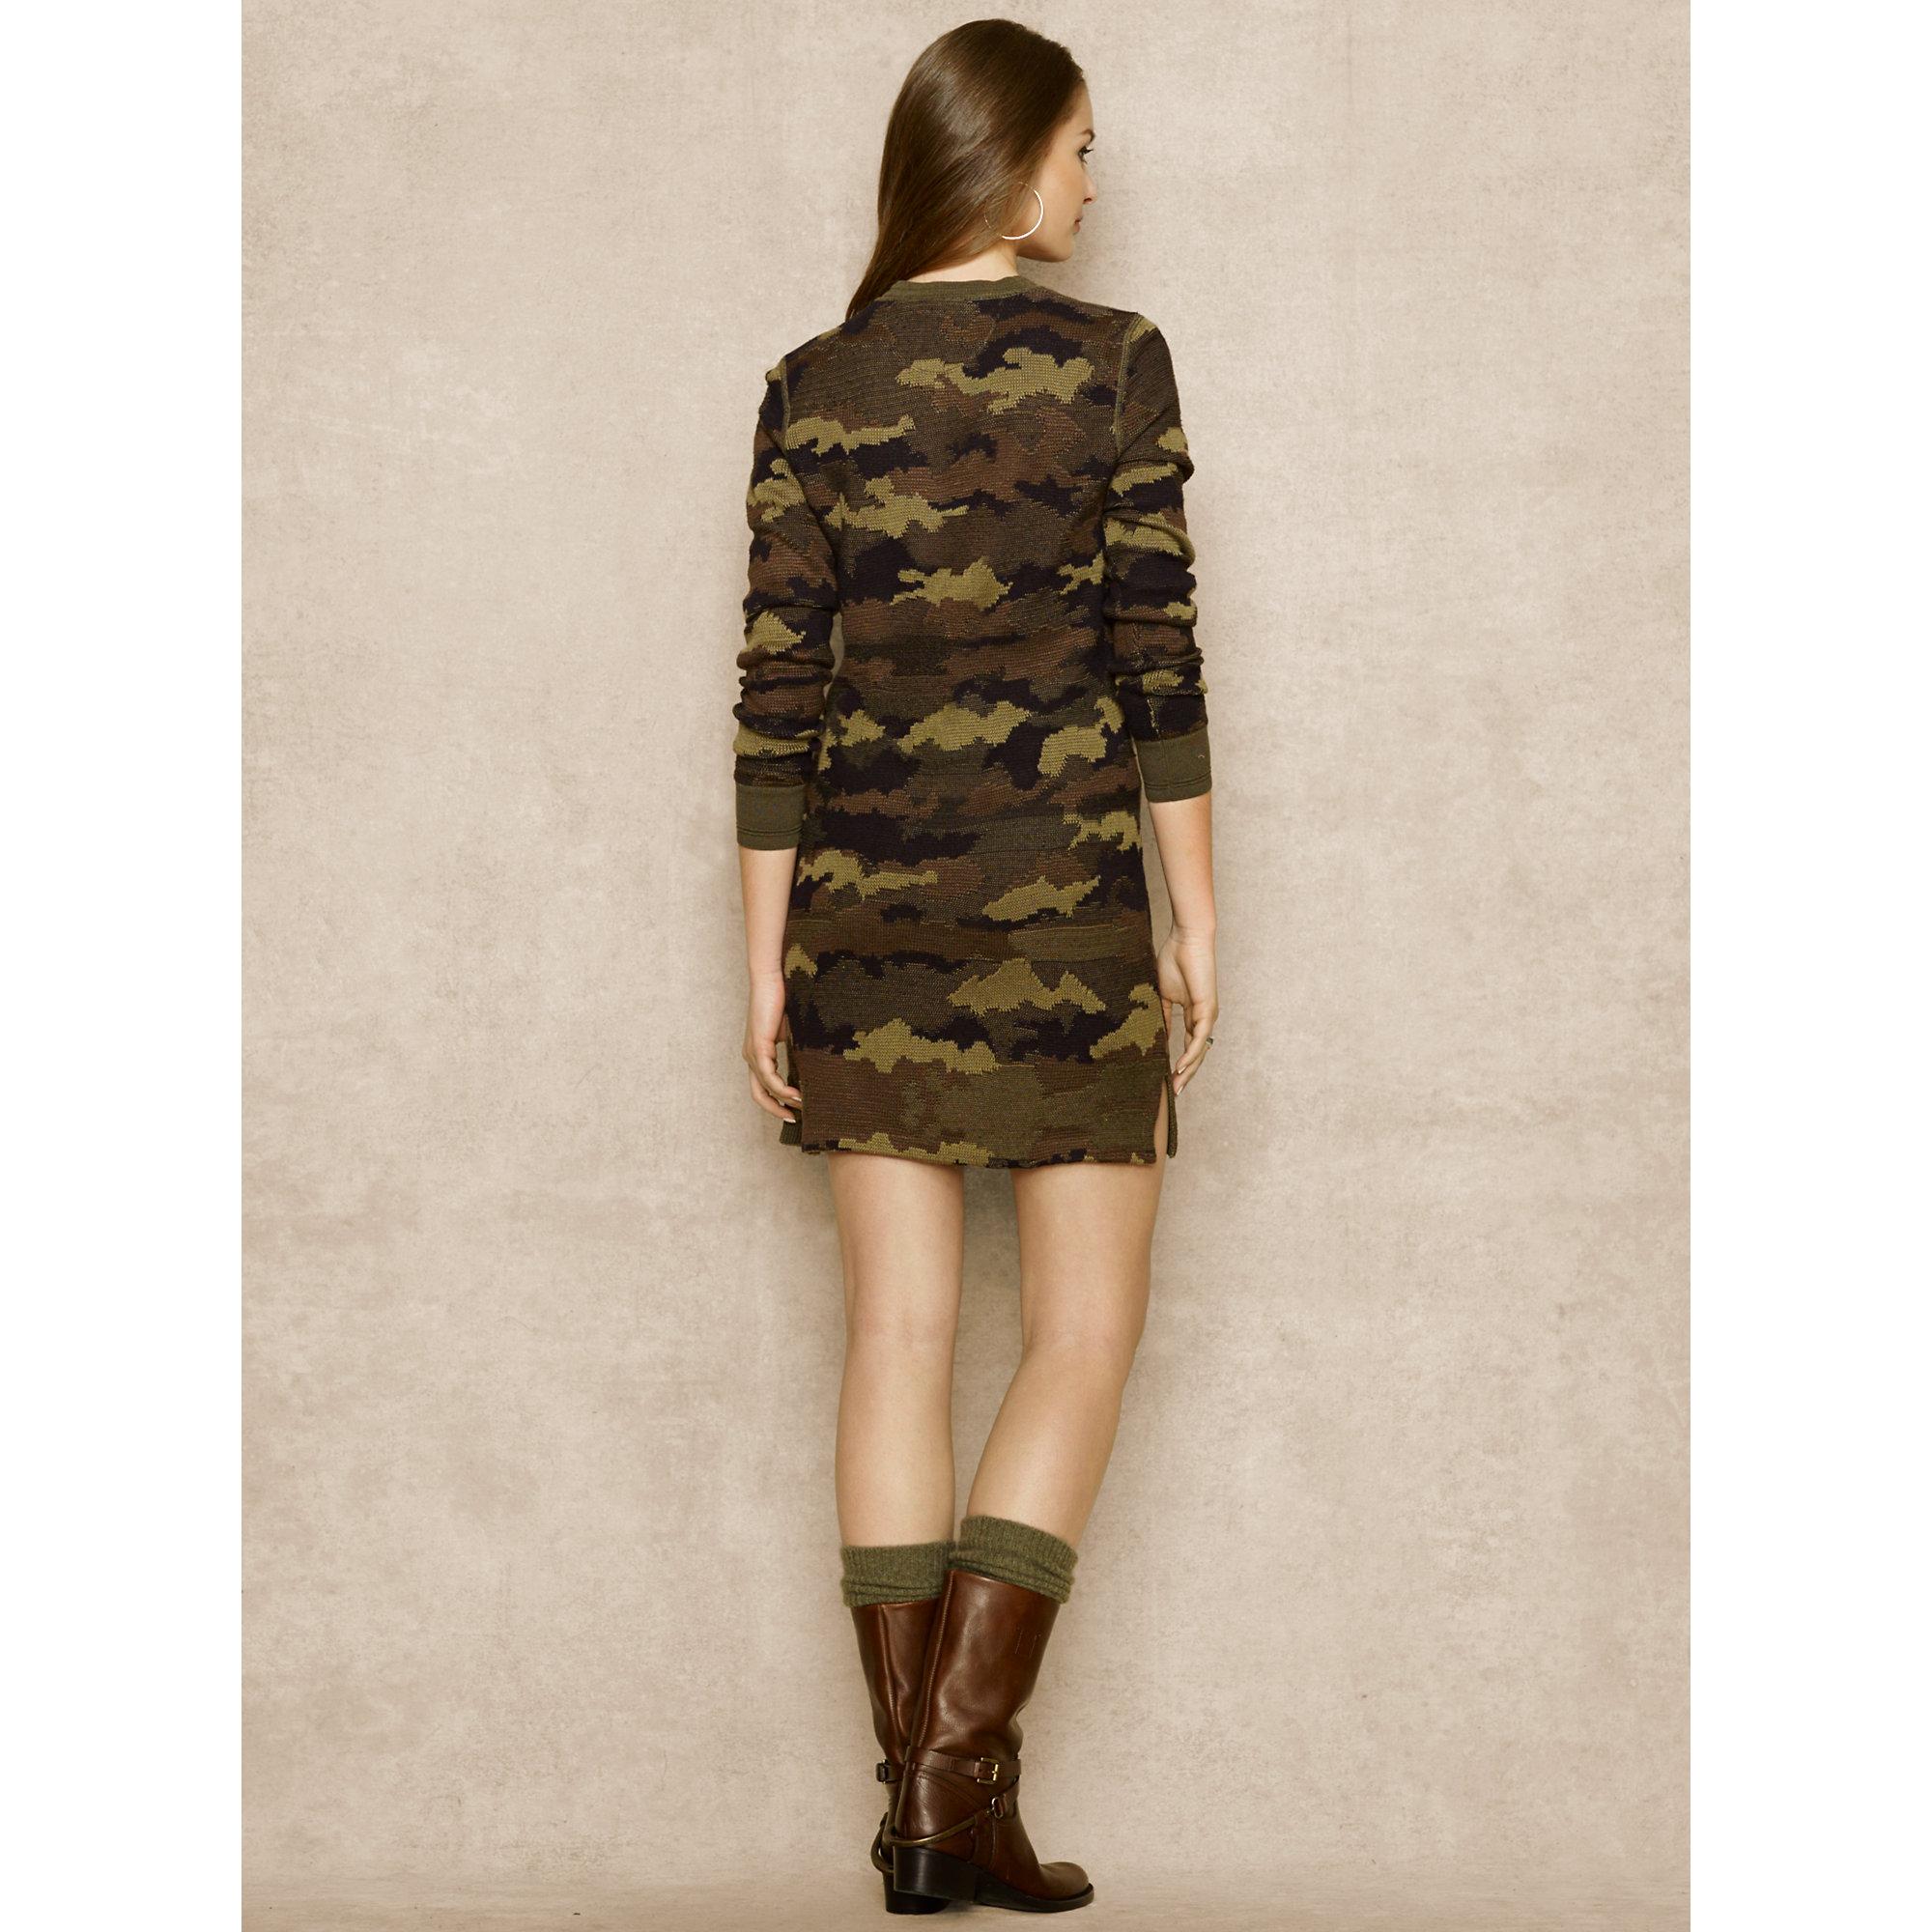 Sweater Dress Camouflage